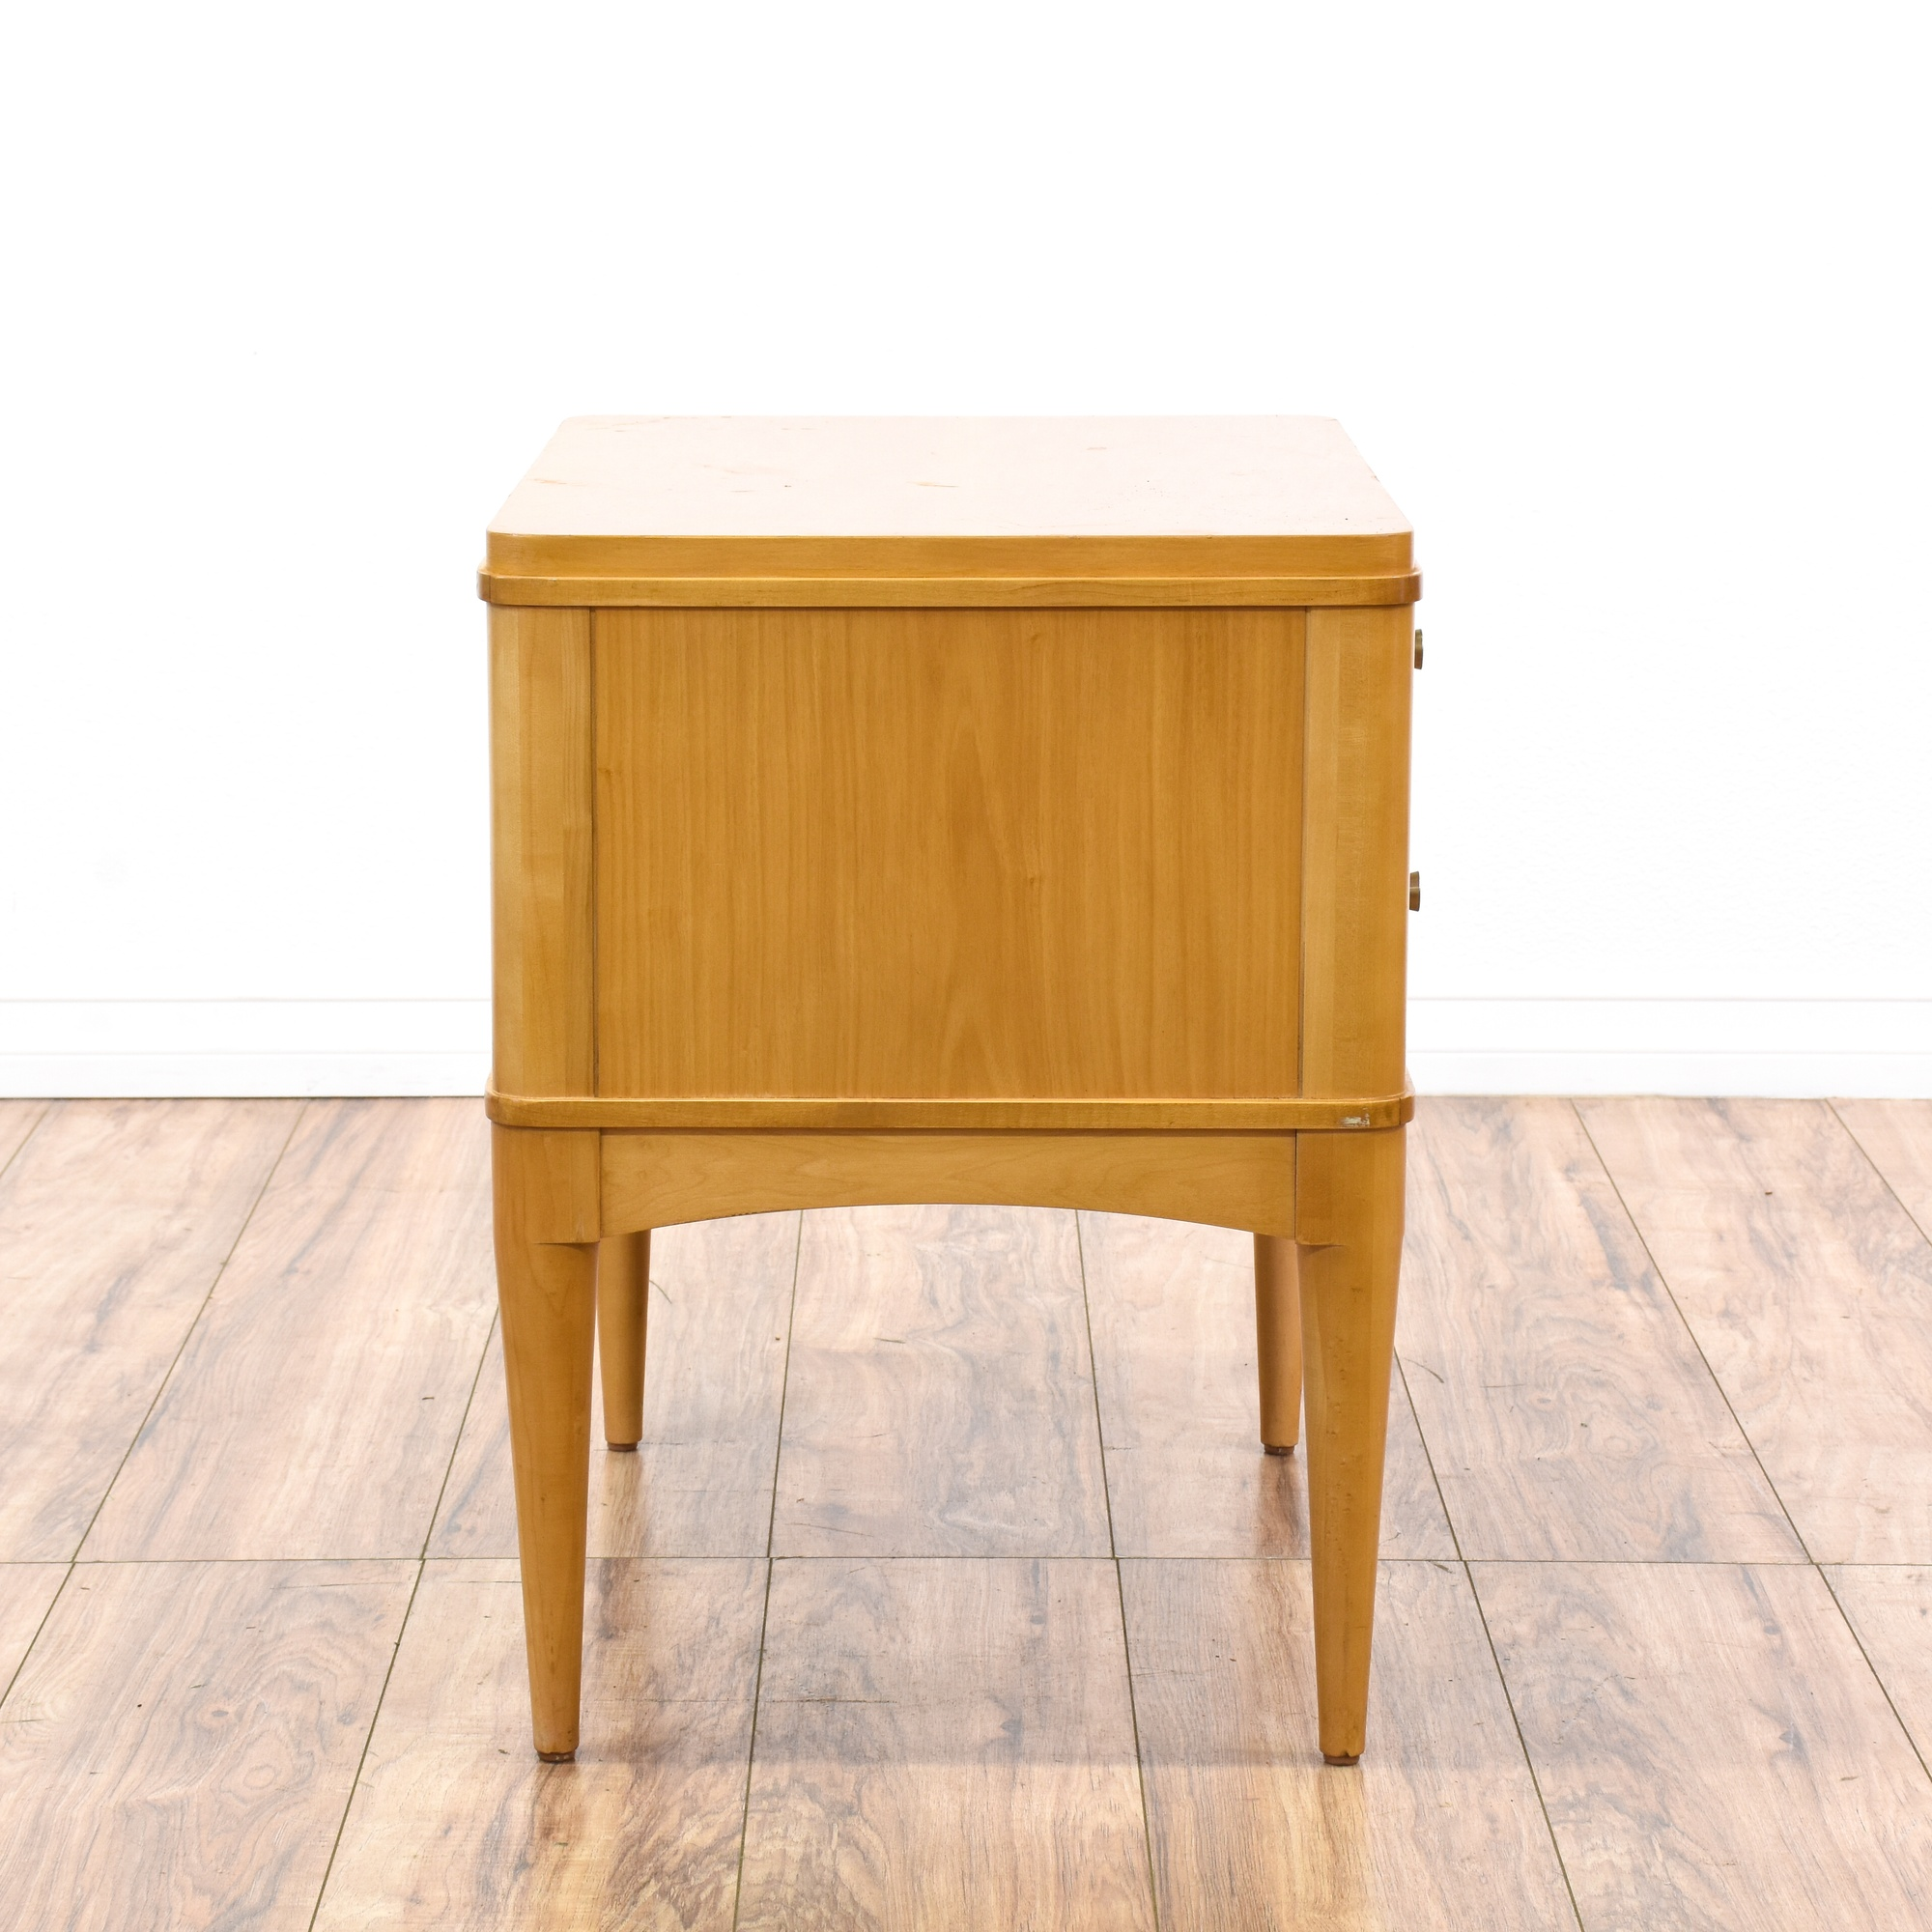 Ethan allen radius mid century modern nightstand for Mid century furniture san francisco